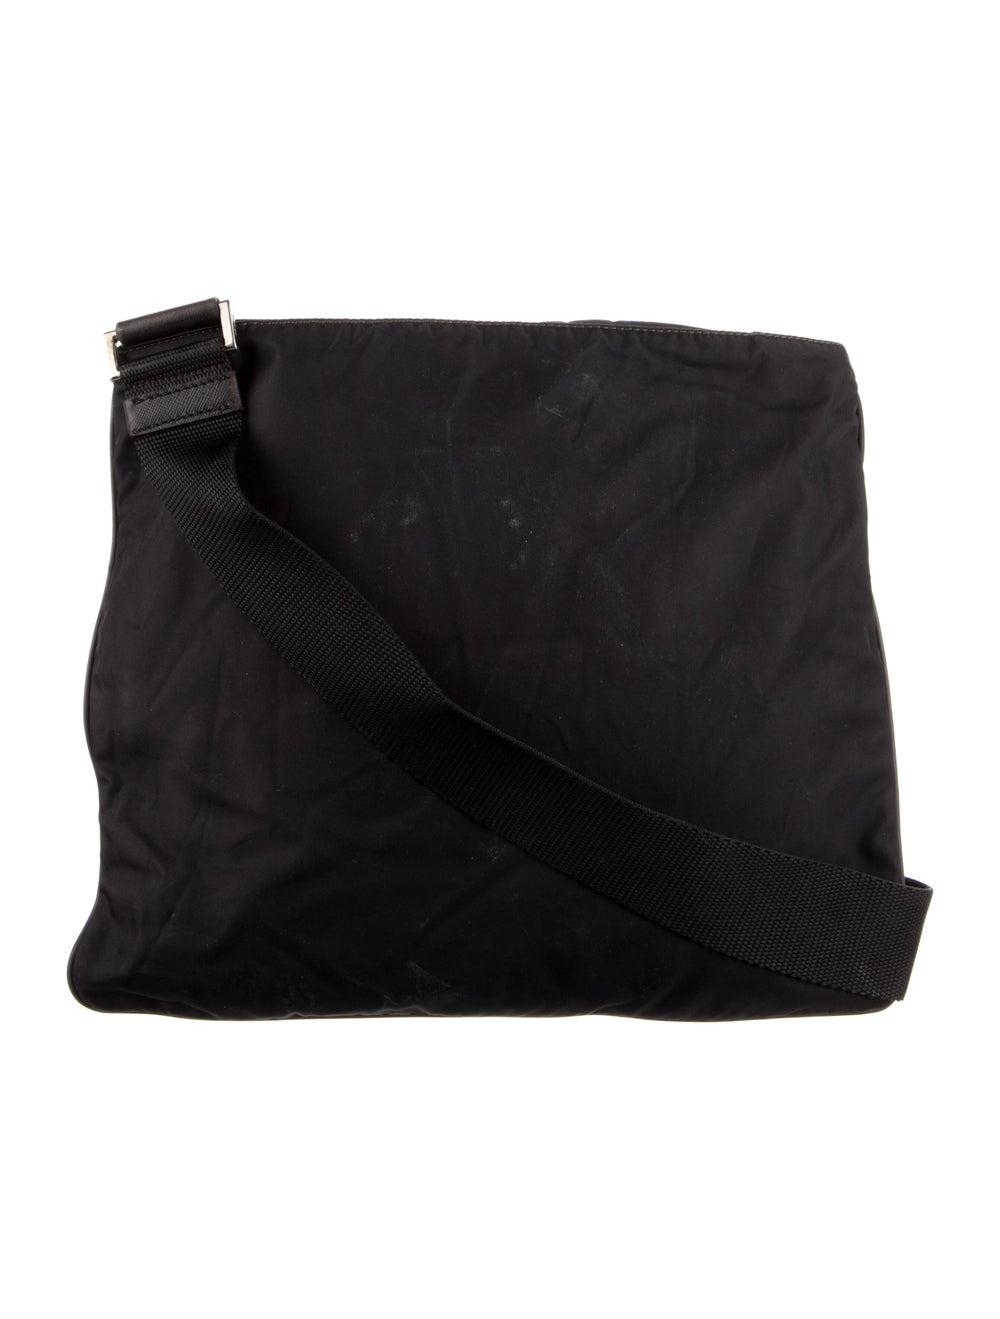 Prada Tessuto Messenger Bag Black - image 4